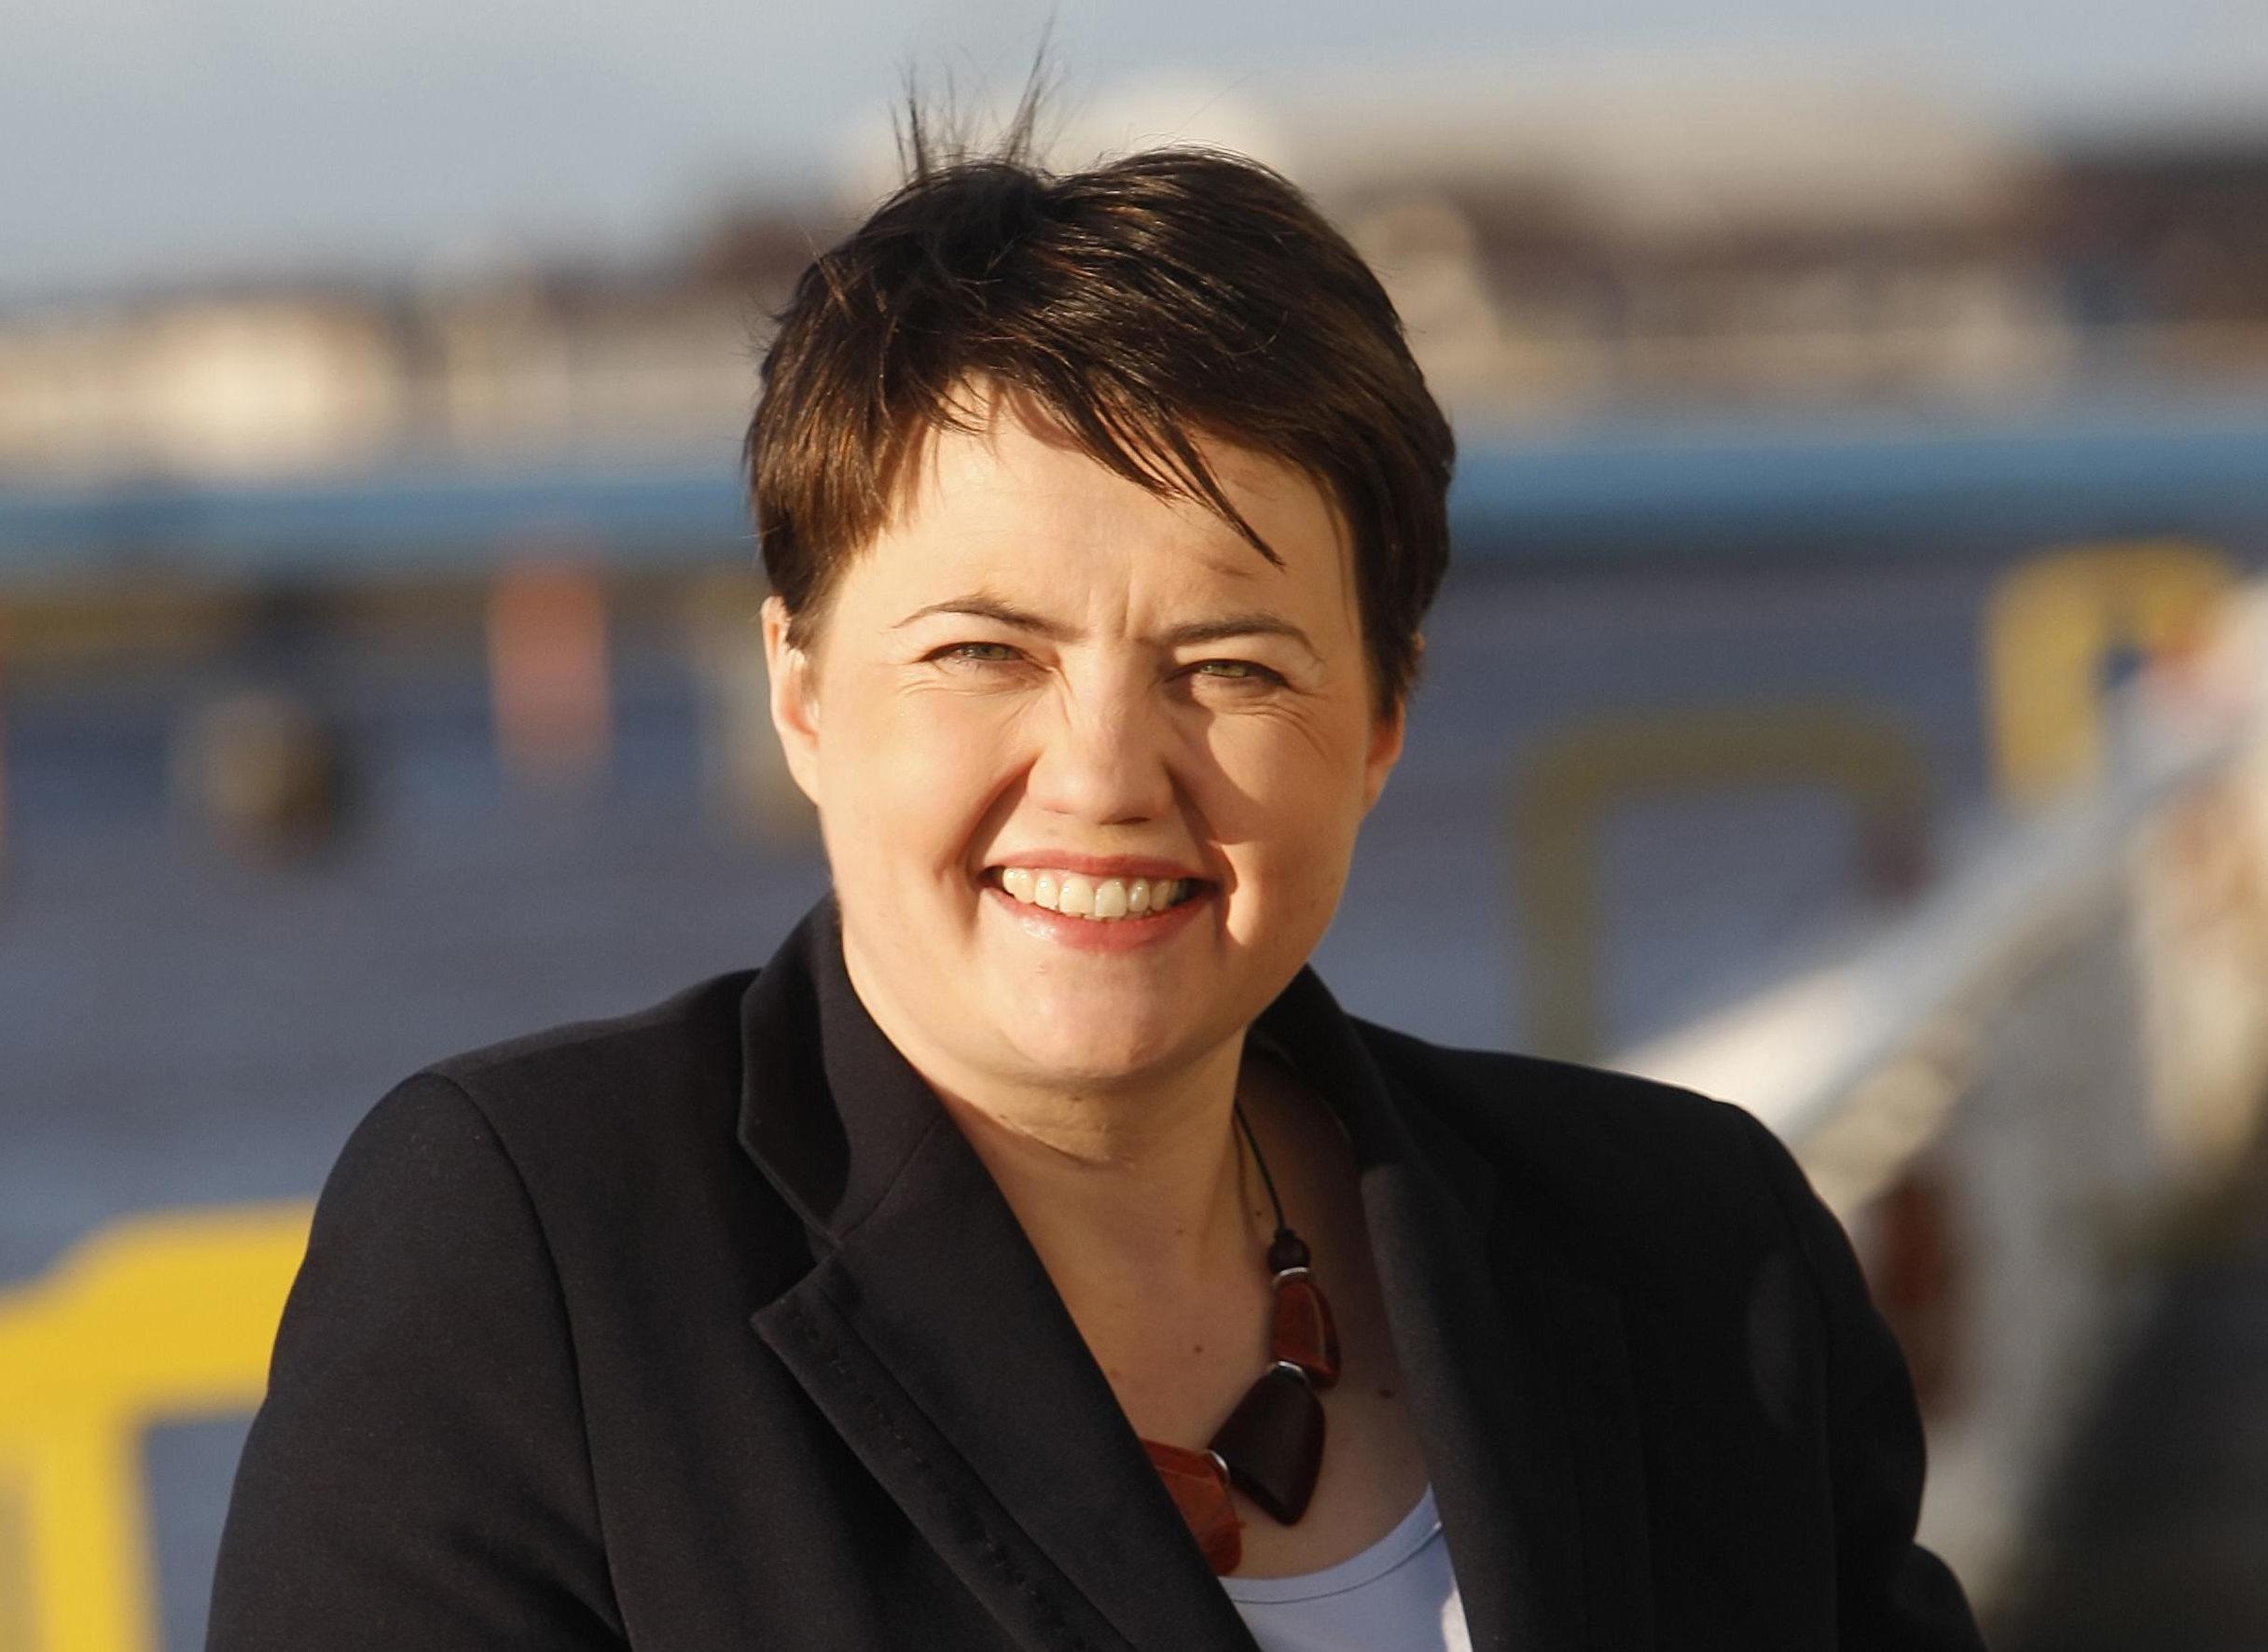 Scottish Conservative leader Ruth Davidson (Danny Lawson/PA Wire)